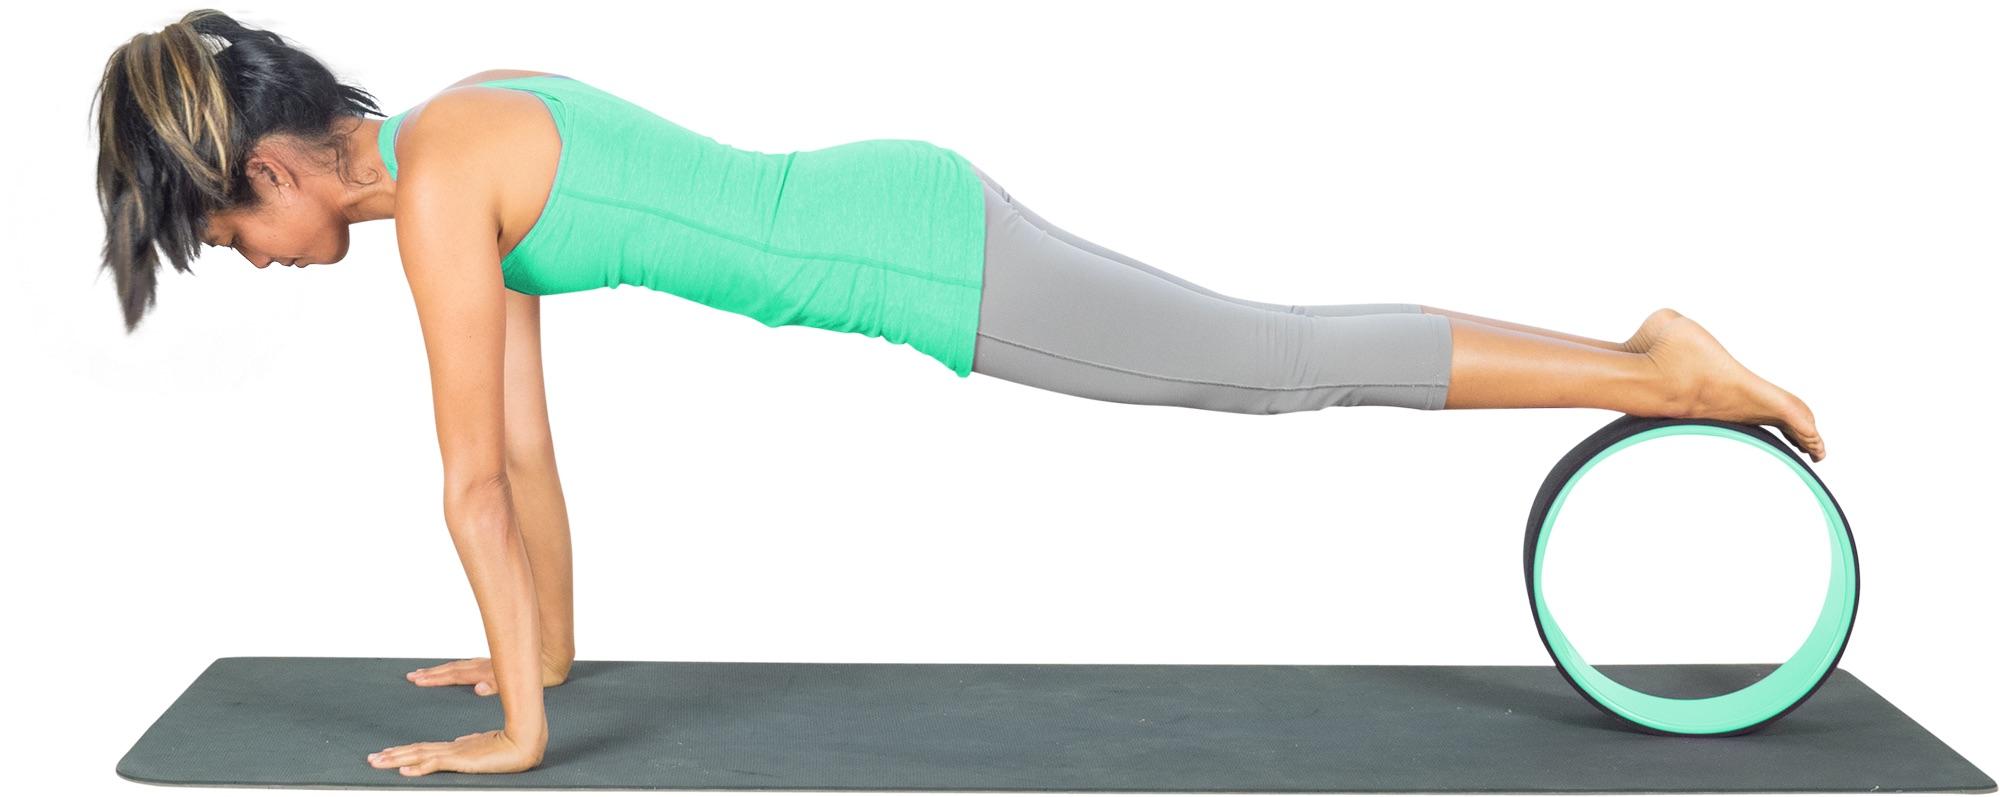 Yoga Wheel Pose Guide 50 Easy Exercises for Beginners   UpCircleSeven